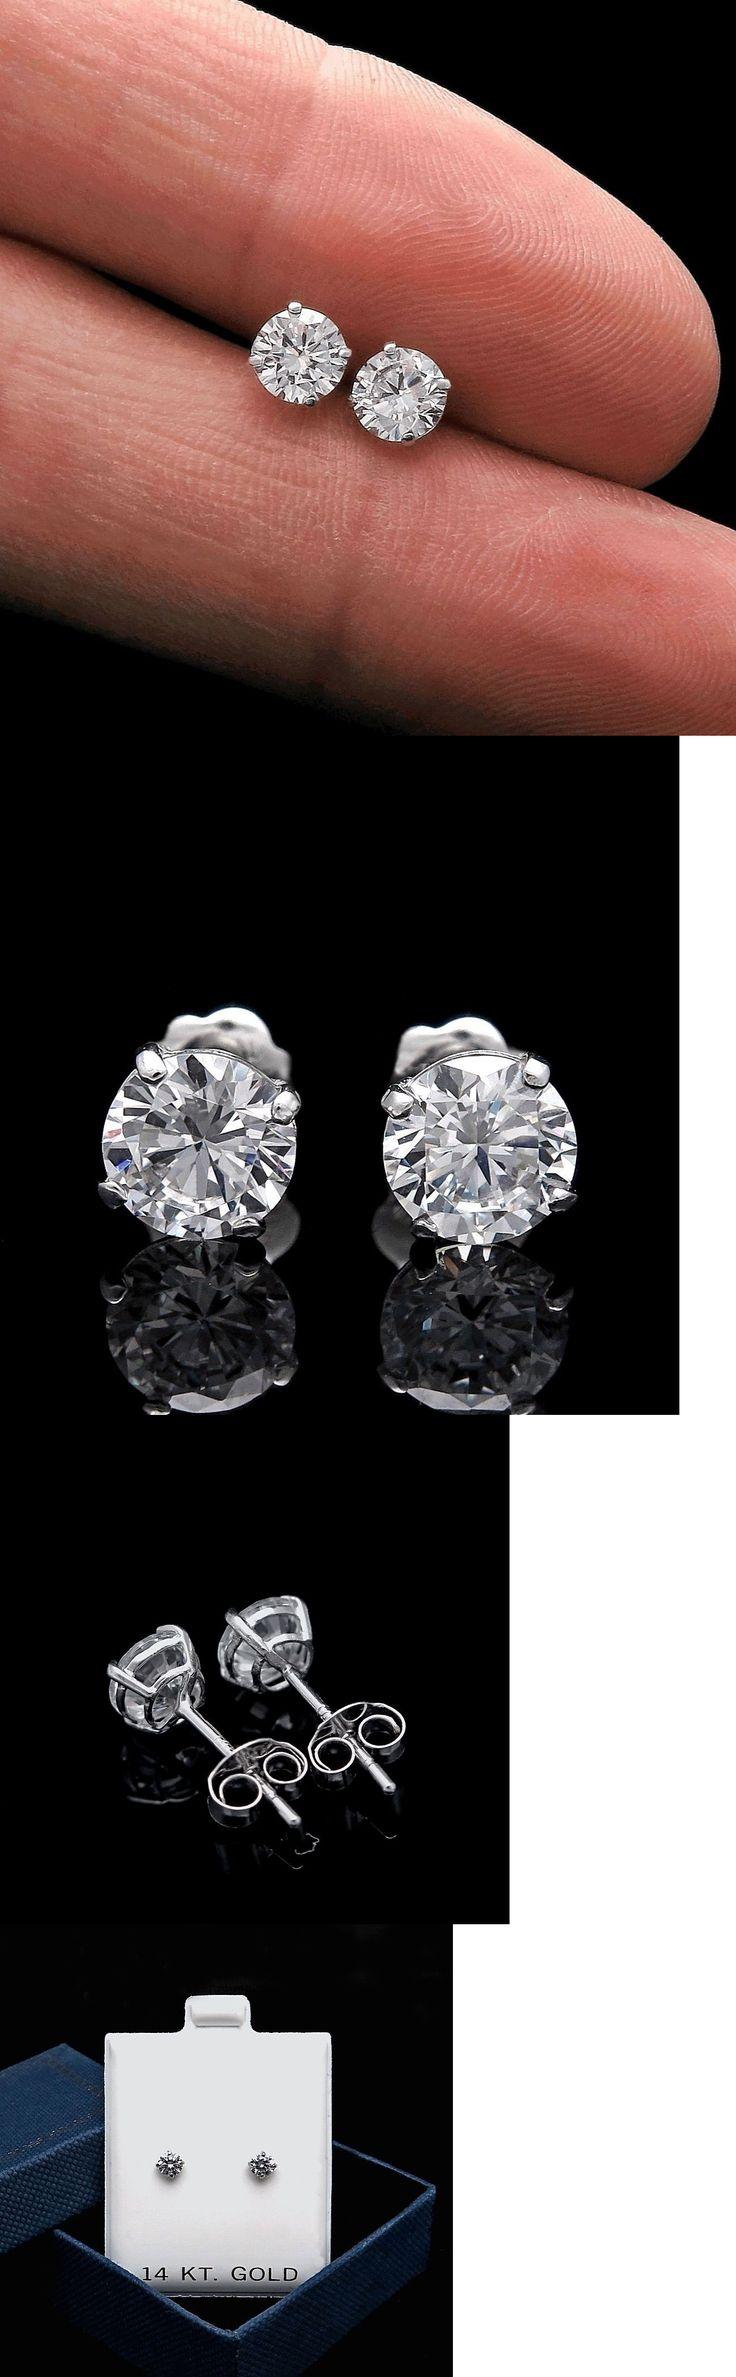 Miadora signature collection 14k white gold 1ct tdw diamond double row - Diamond 10986 1 25ct Brilliant Created Diamond Solitaire Earrings 14k White Gold Round Studs